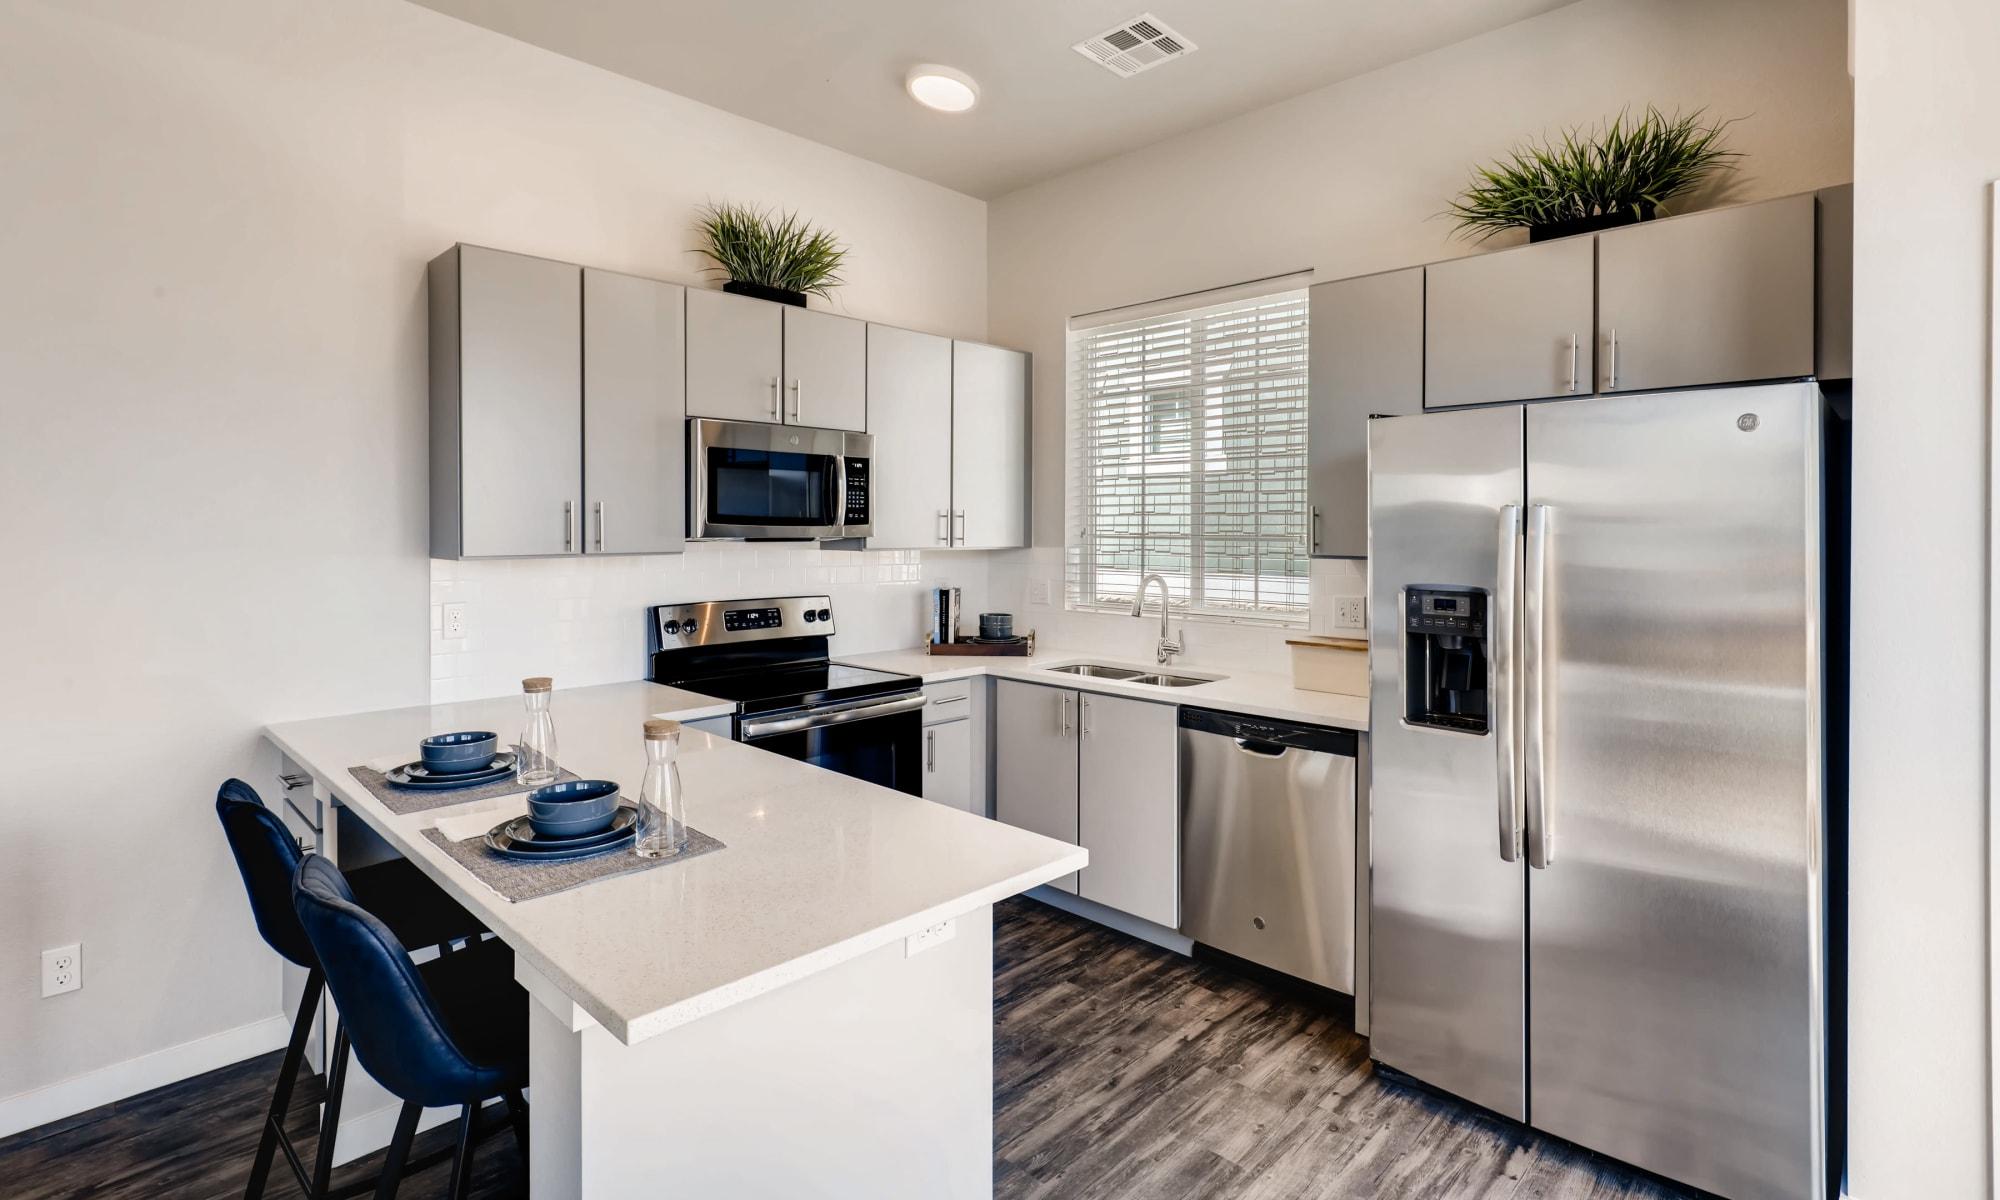 Apartment homes at Avilla Eastlake in Thornton, Colorado